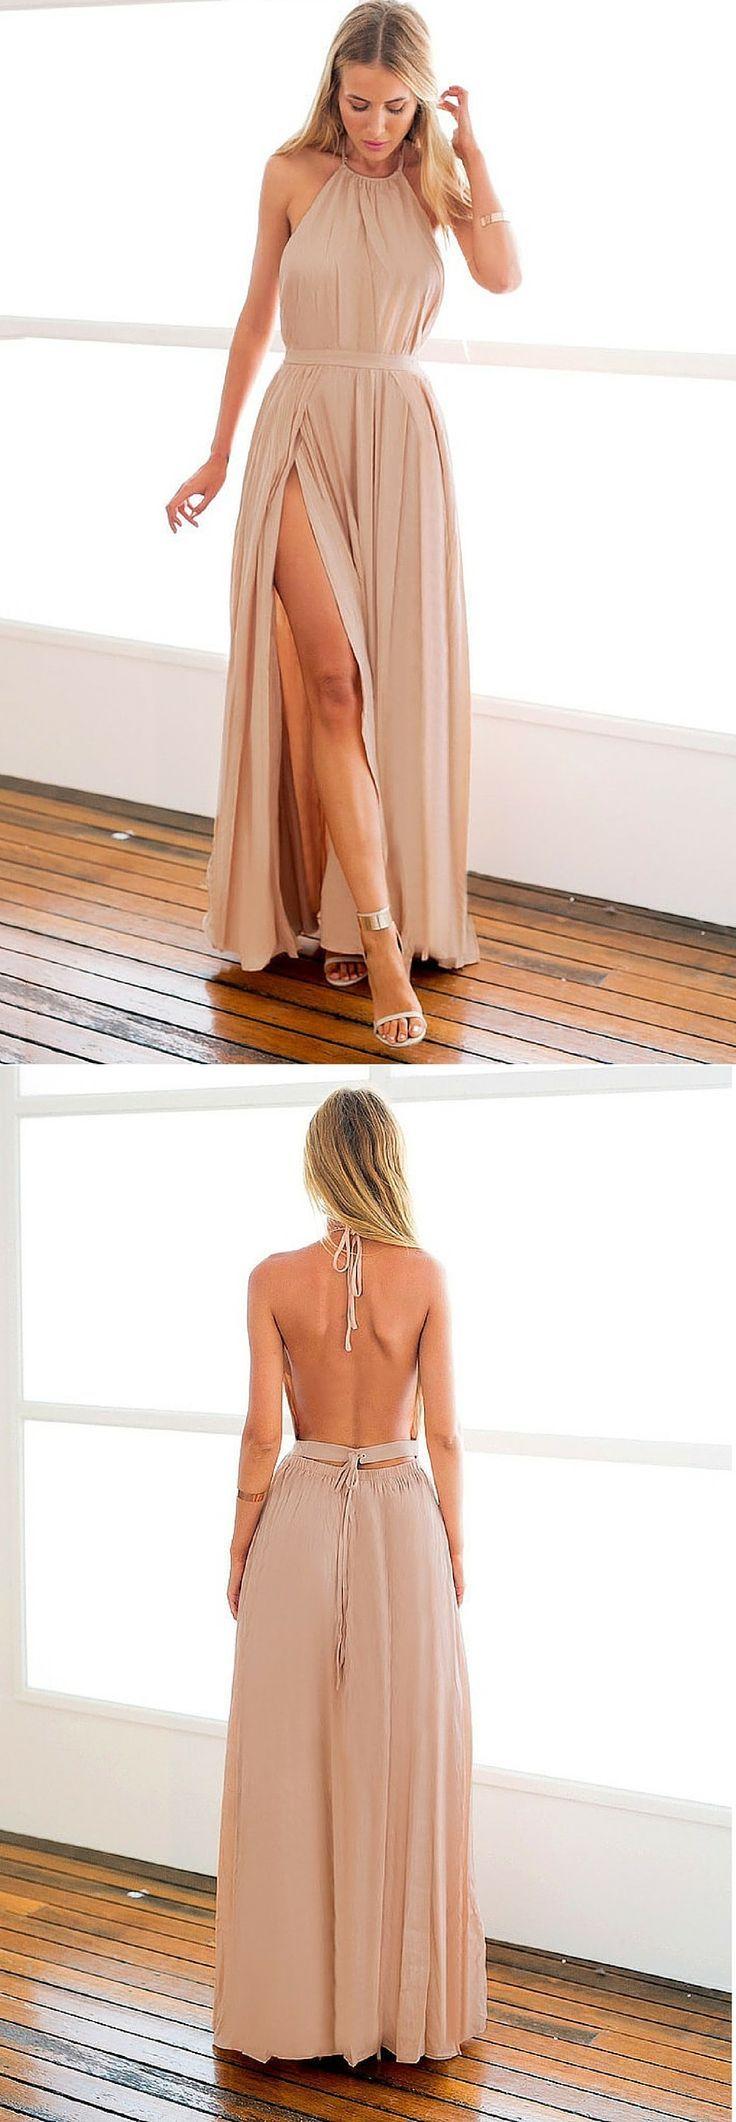 pulchritudinous  Cocktail Day Time Dresses 2016 Cocktail Dress 2017